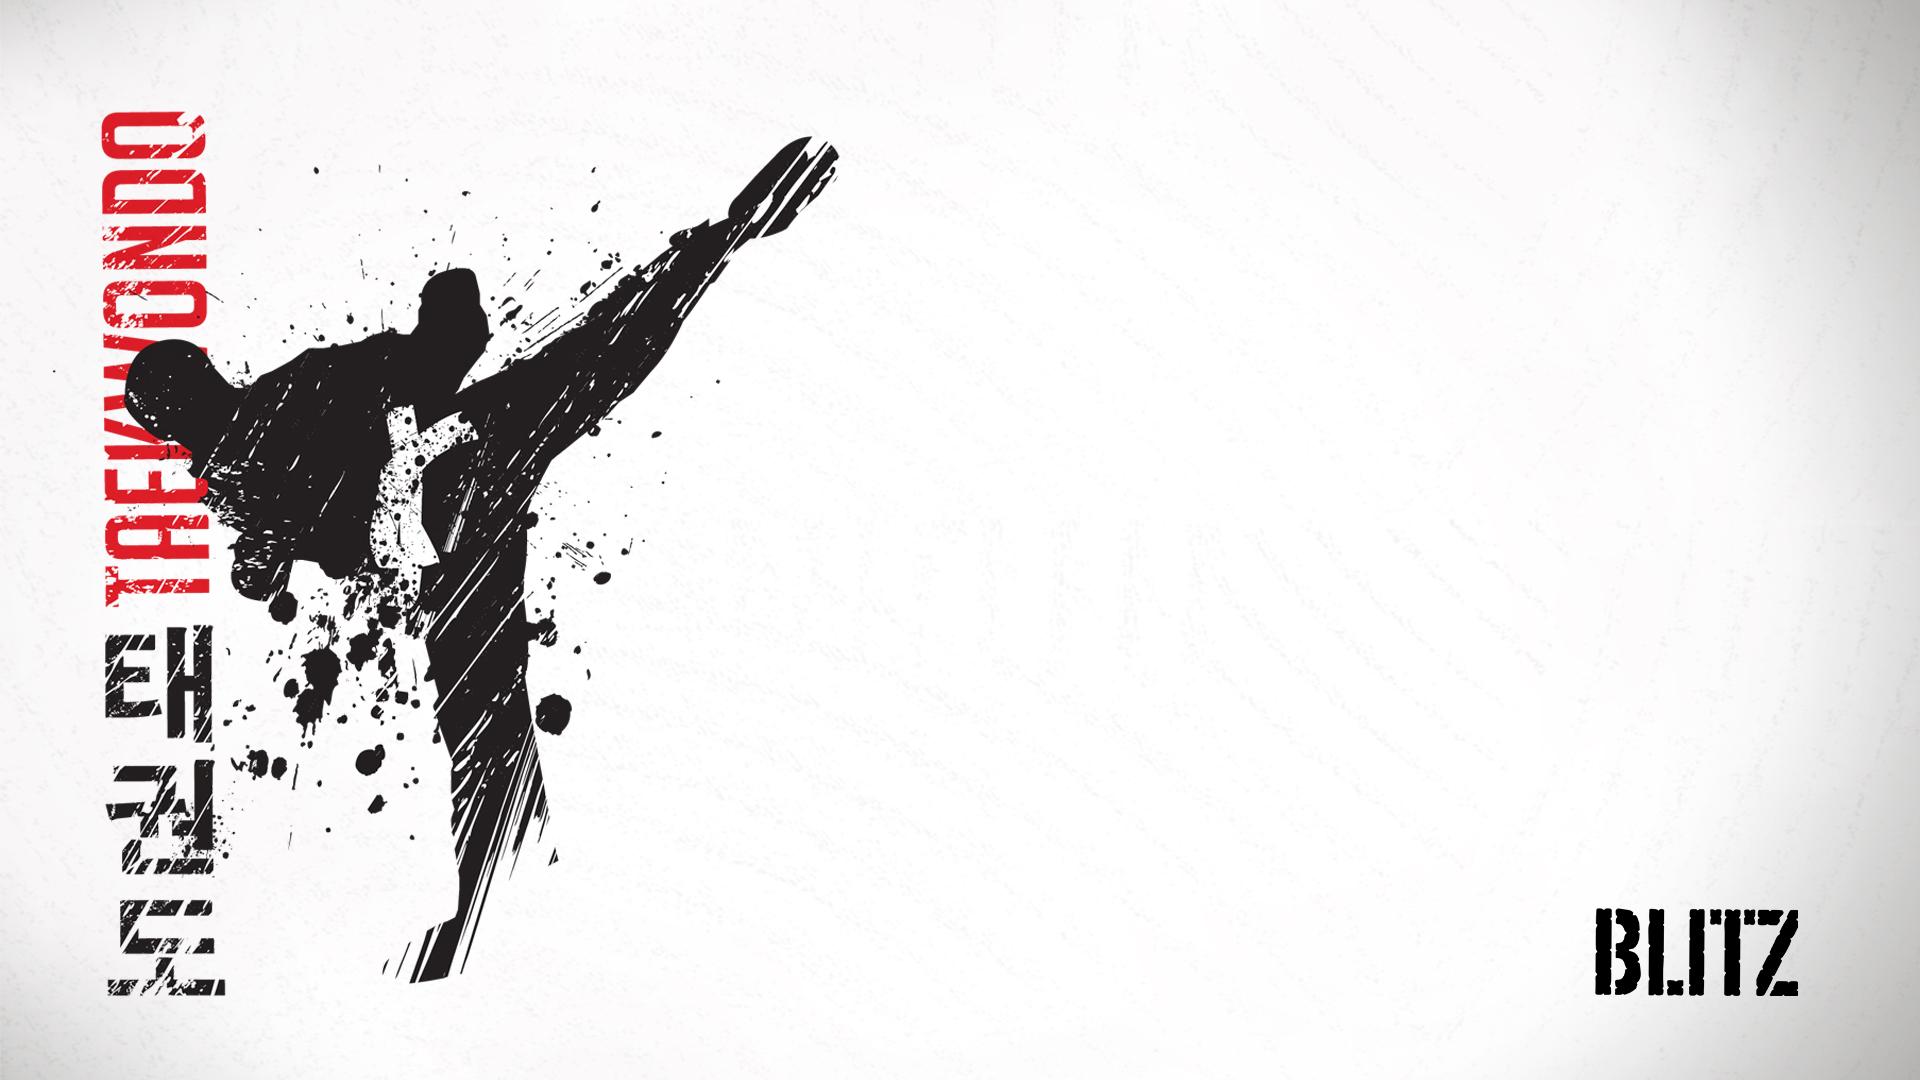 Blitz-Taekwondo-1920-x-1080-wallpaper-wpc9002996